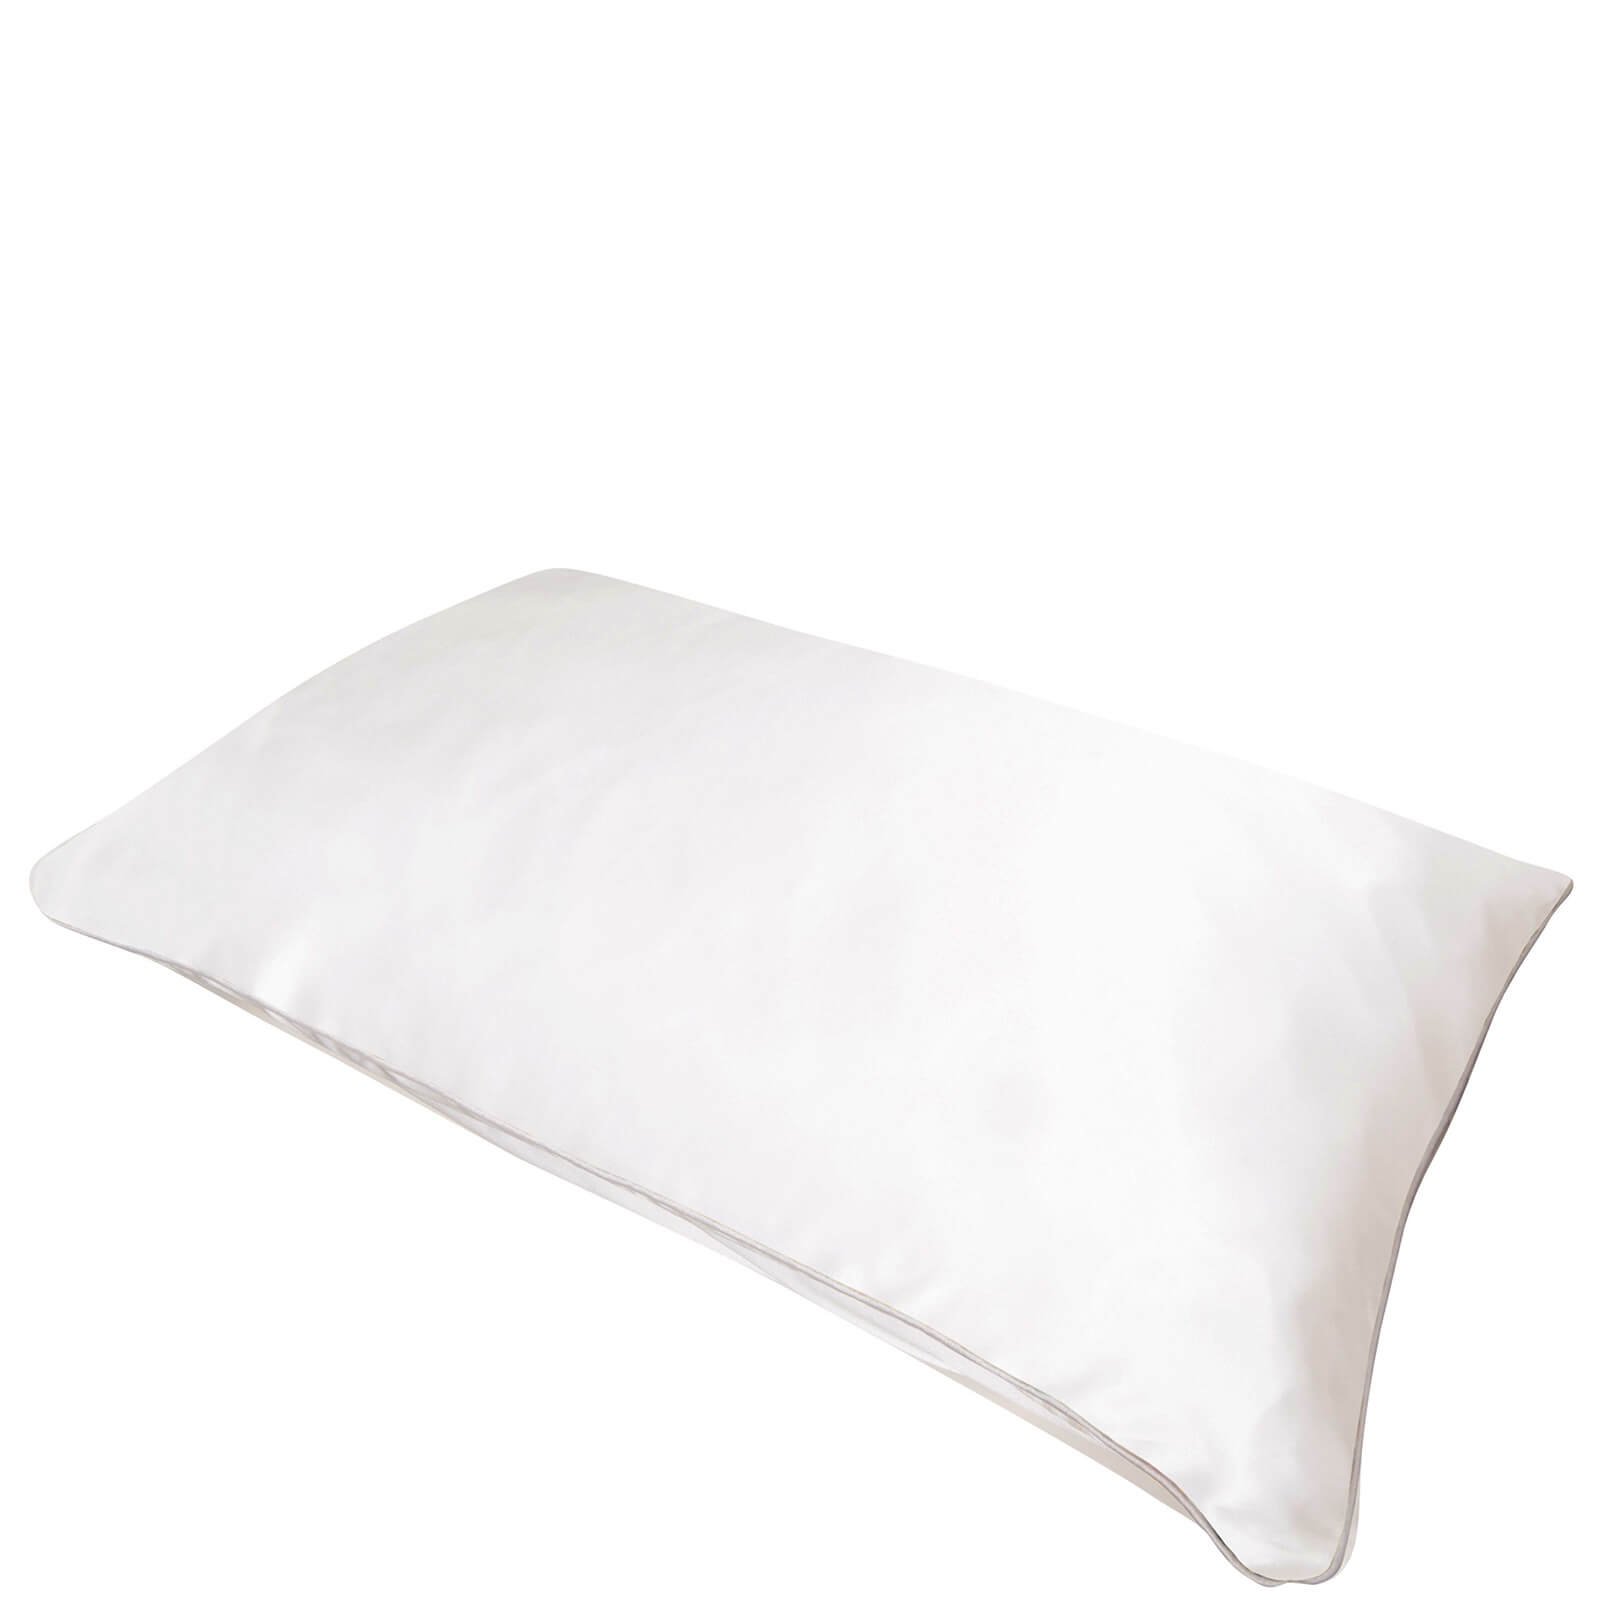 Купить Holistic Silk Rejuvenating Anti-Ageing Silk Pillowcase - White